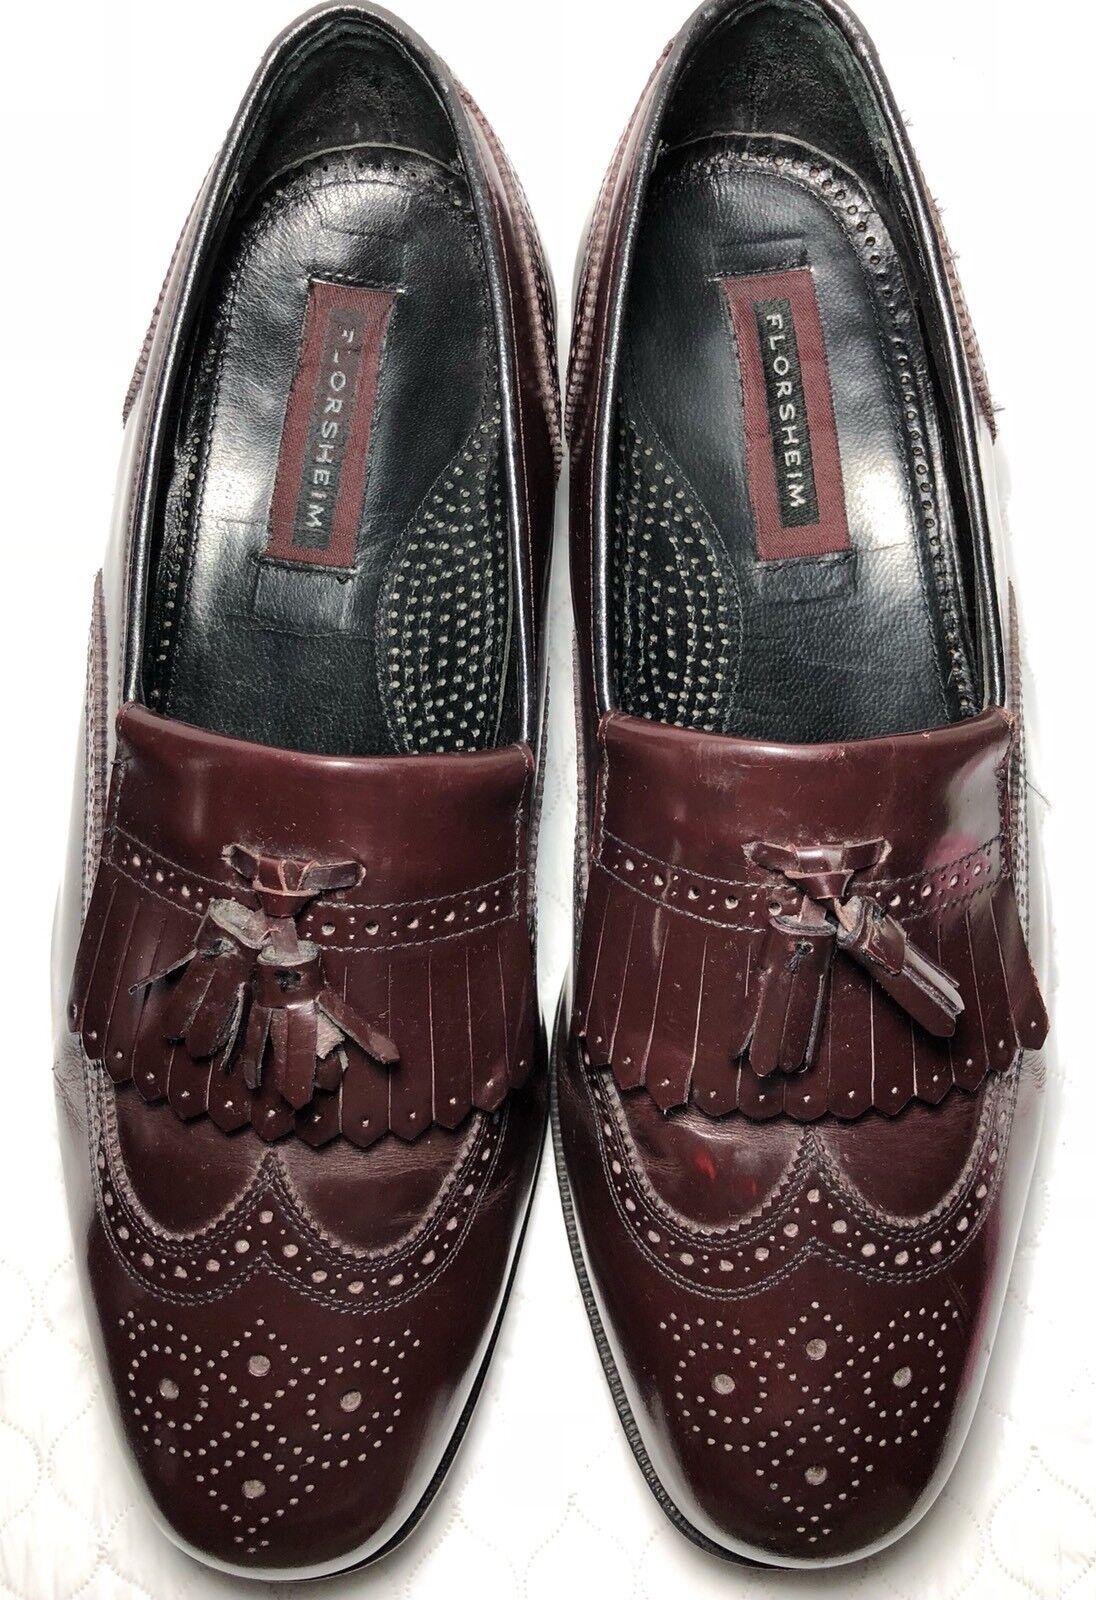 Florsheim Men's Lexington Tassel Long Wing Tip Dress  shoes Burgundy Size-10.5